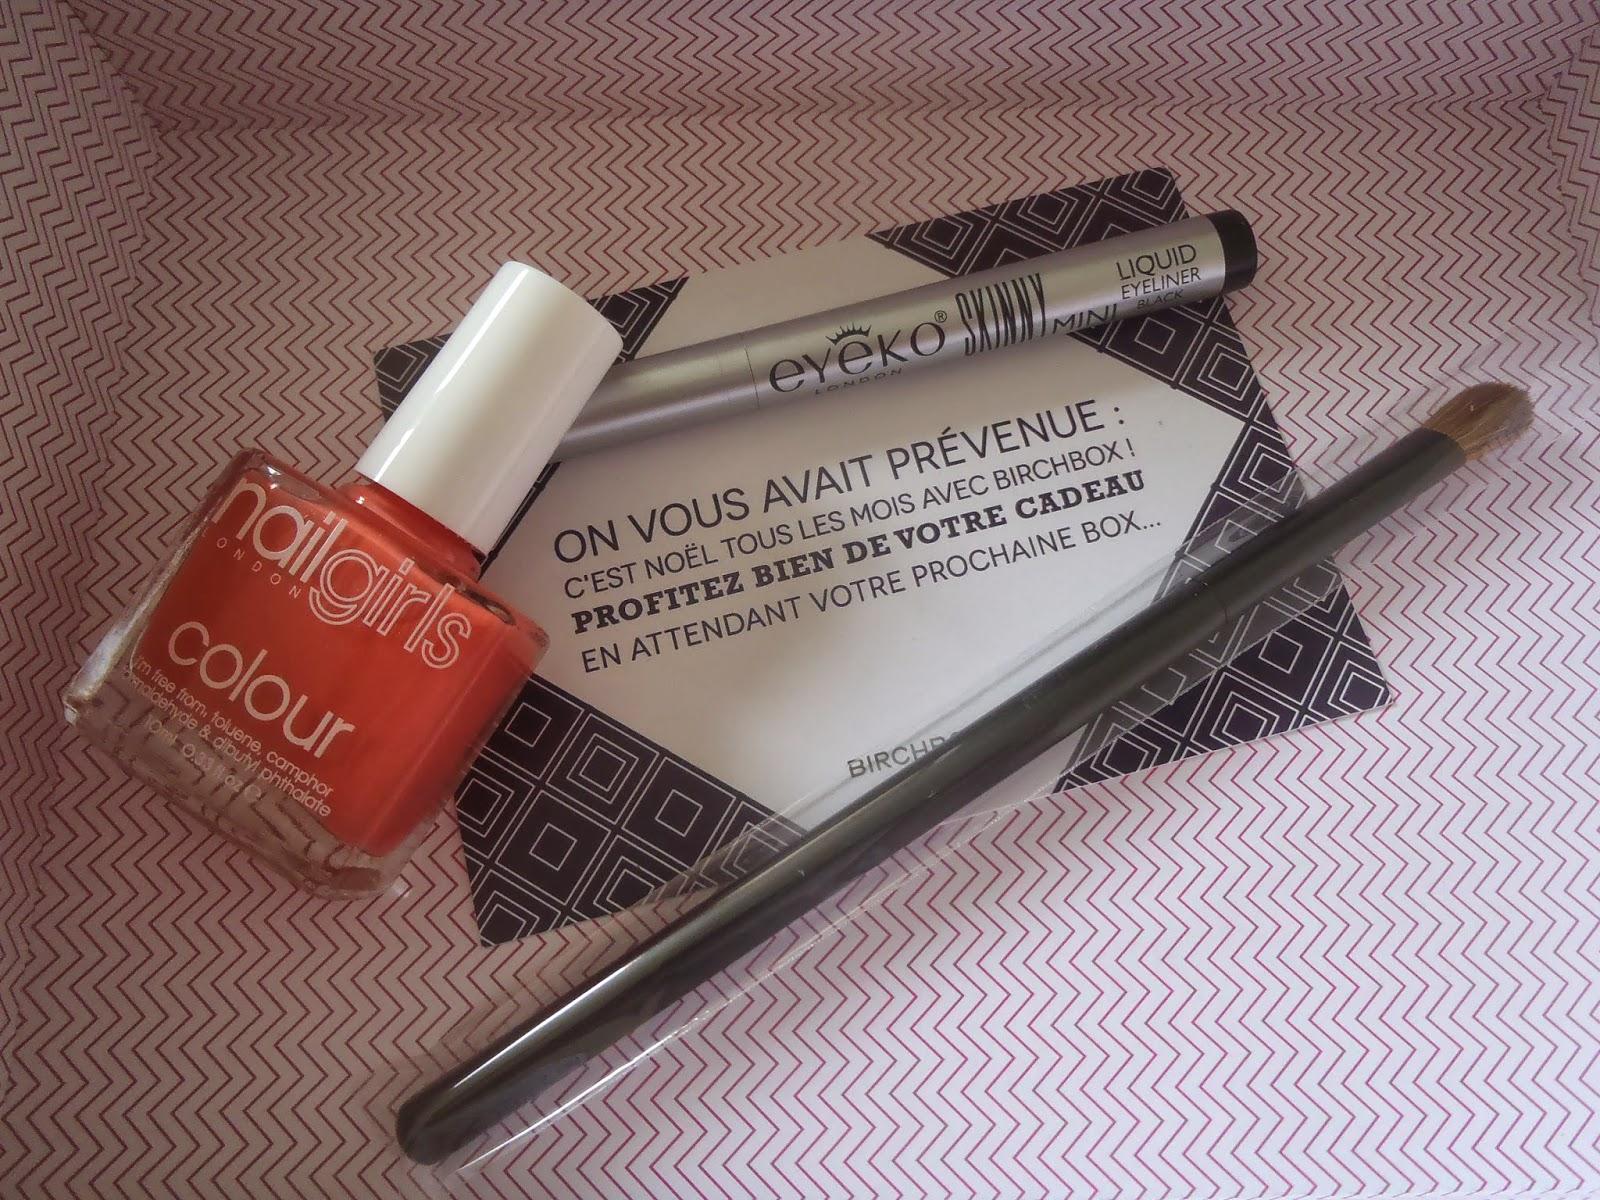 produits birchbox mars 2014, vernis nail girl colour, pinceau birchbox, carte de bienvenue, box beauté, eye liner eyeko, echantillons